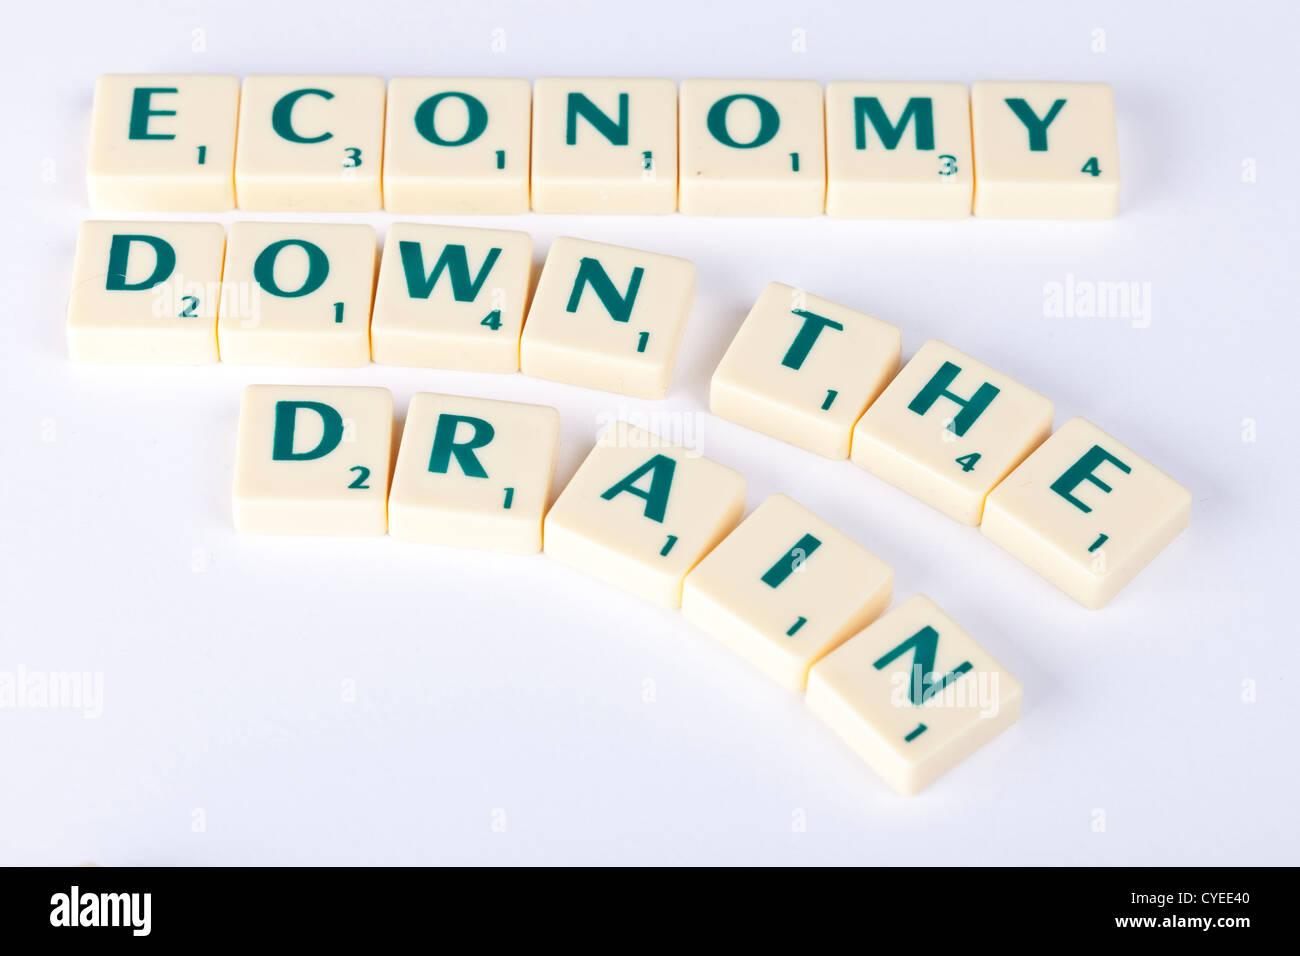 economic downturn, economy down the drain, concept illustration using scrabble letter tiles. - Stock Image